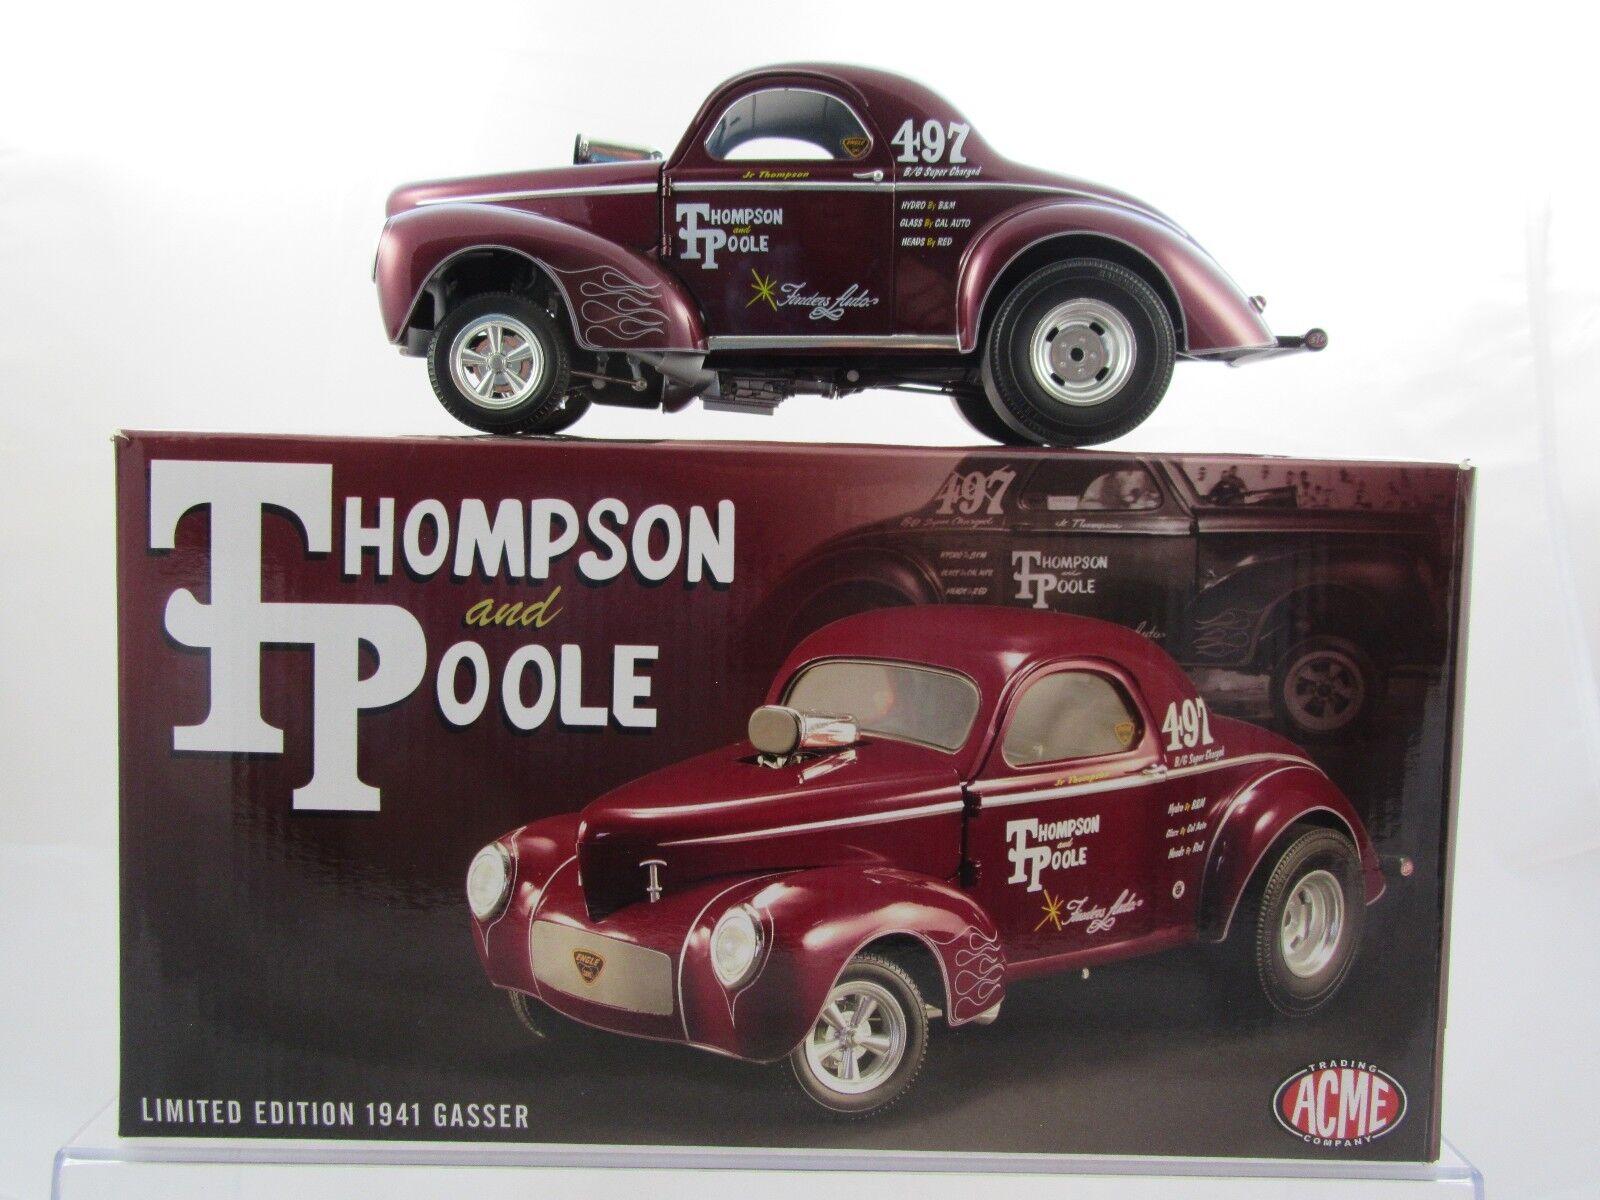 ACME 1941 Thompson & Poole Gasser A1800909